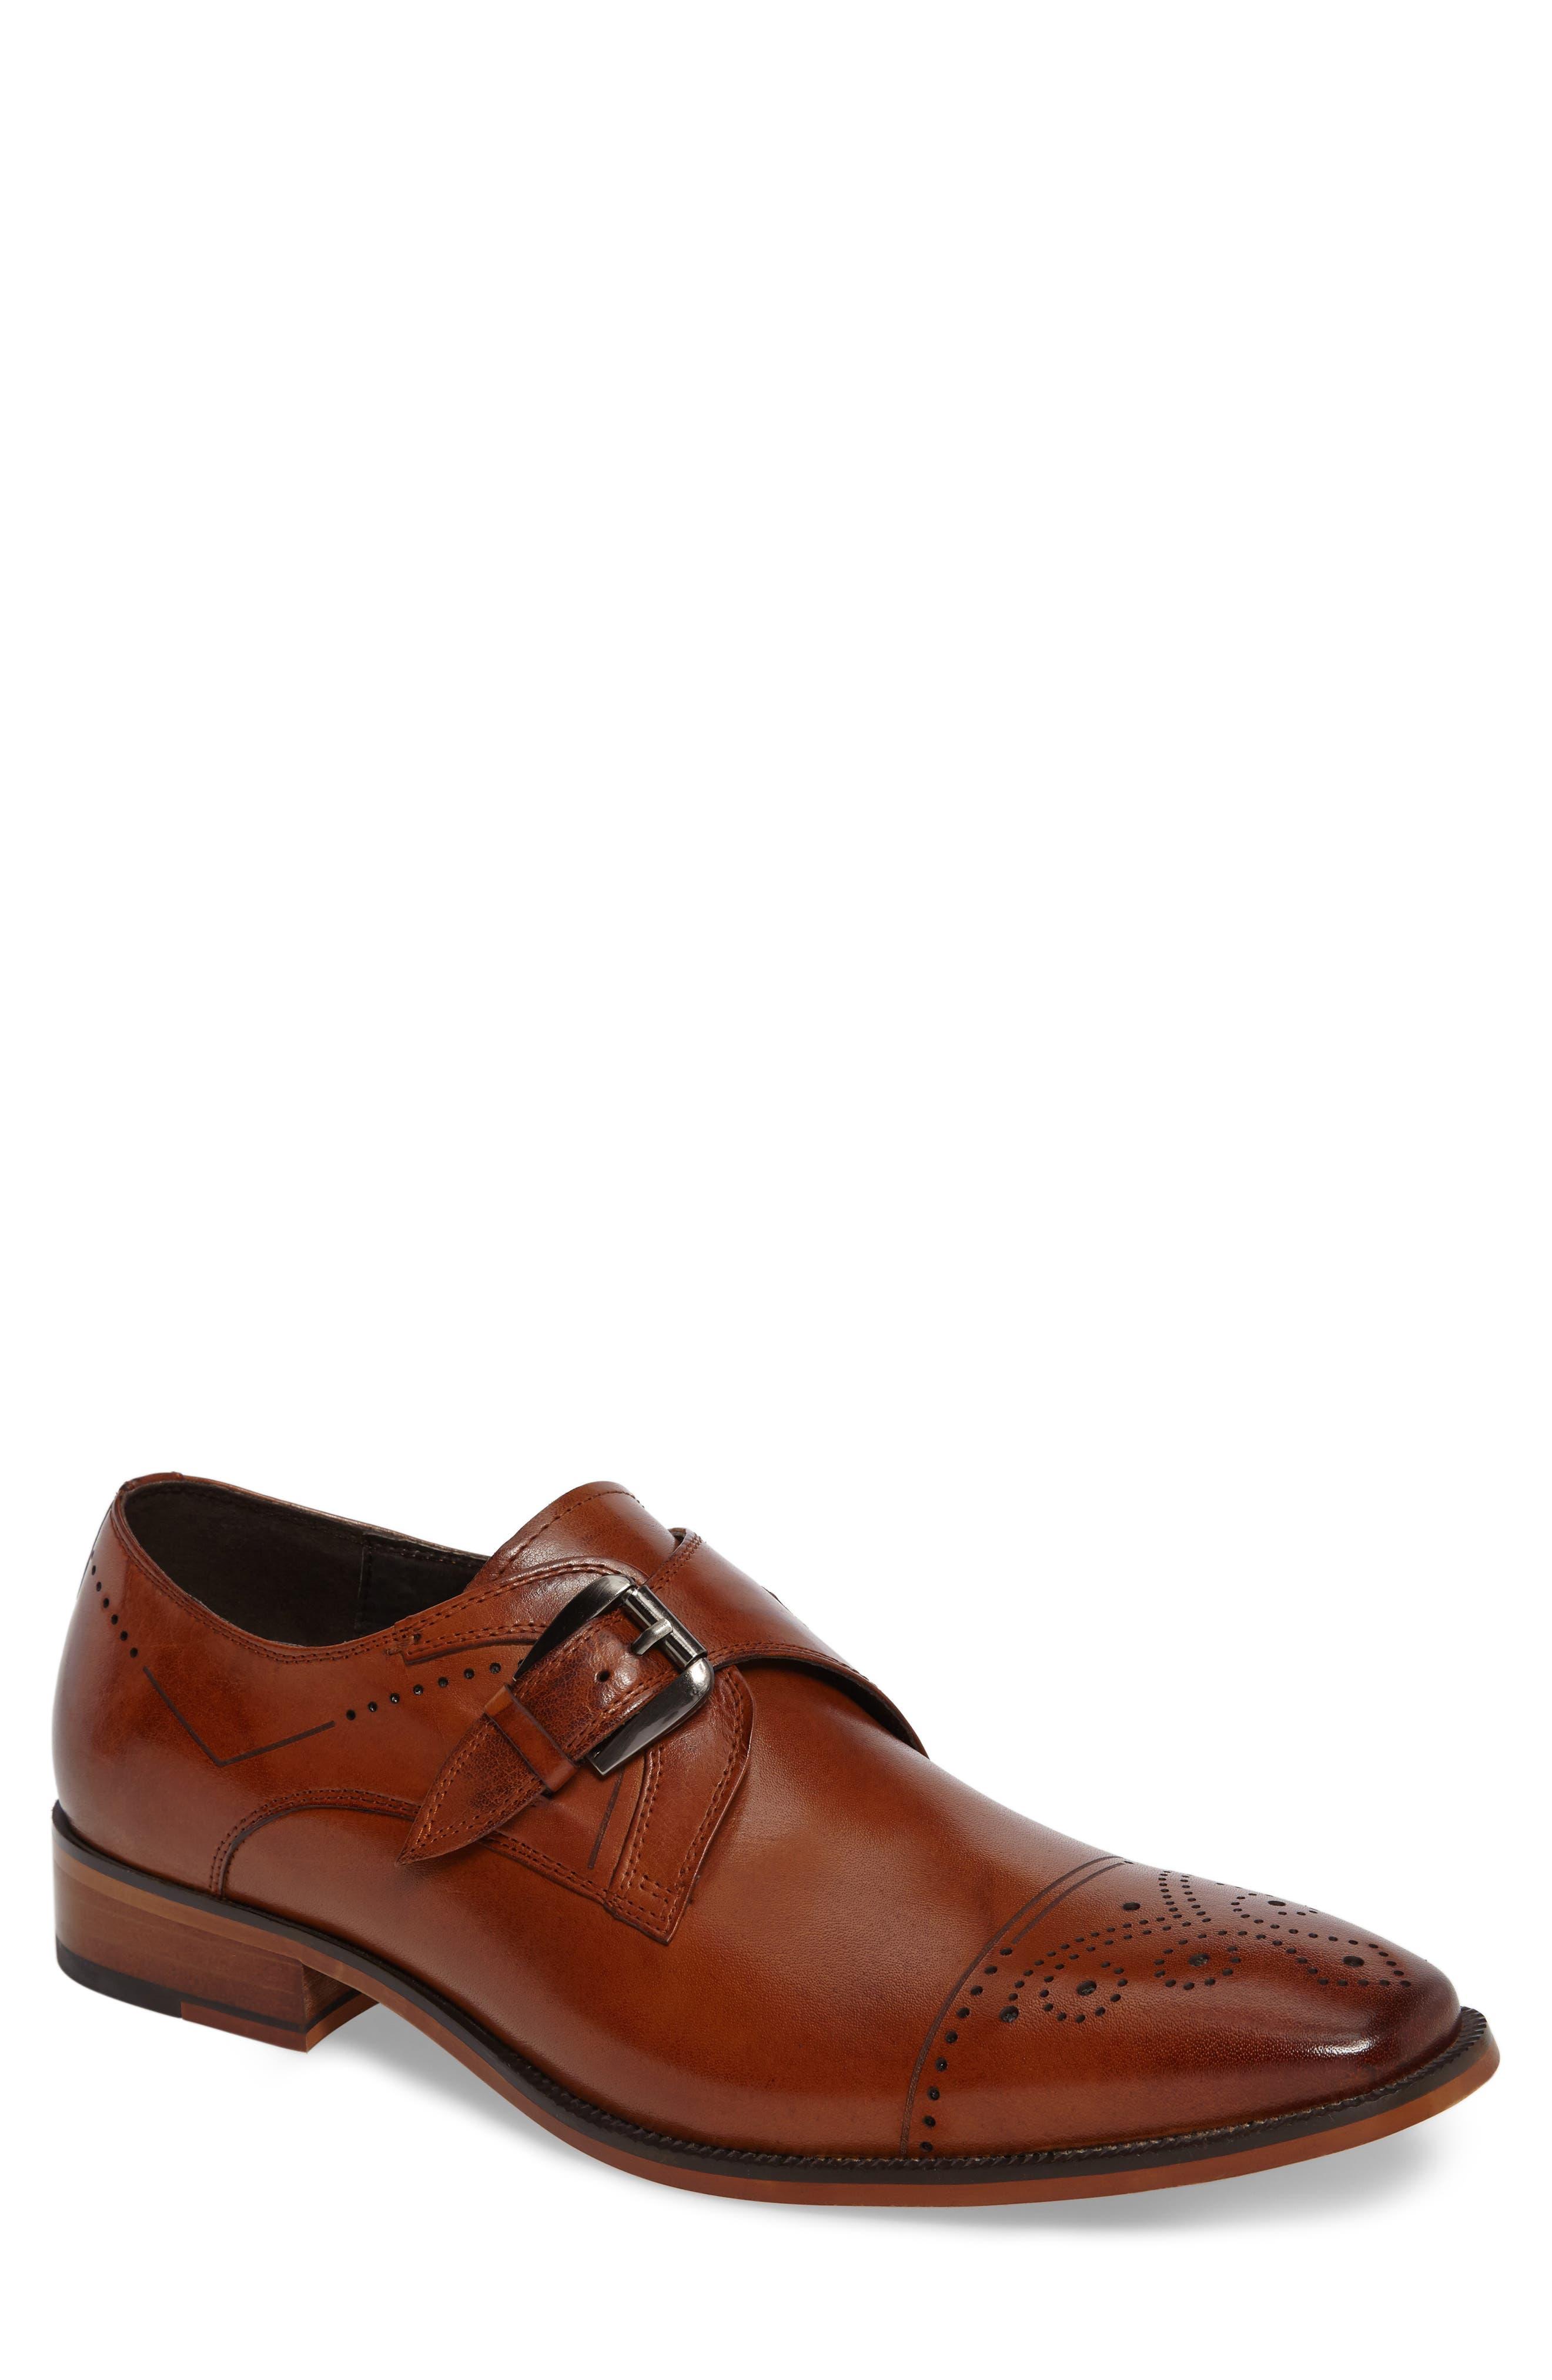 Kimball Monk Strap Shoe,                             Main thumbnail 1, color,                             SADDLE TAN LEATHER